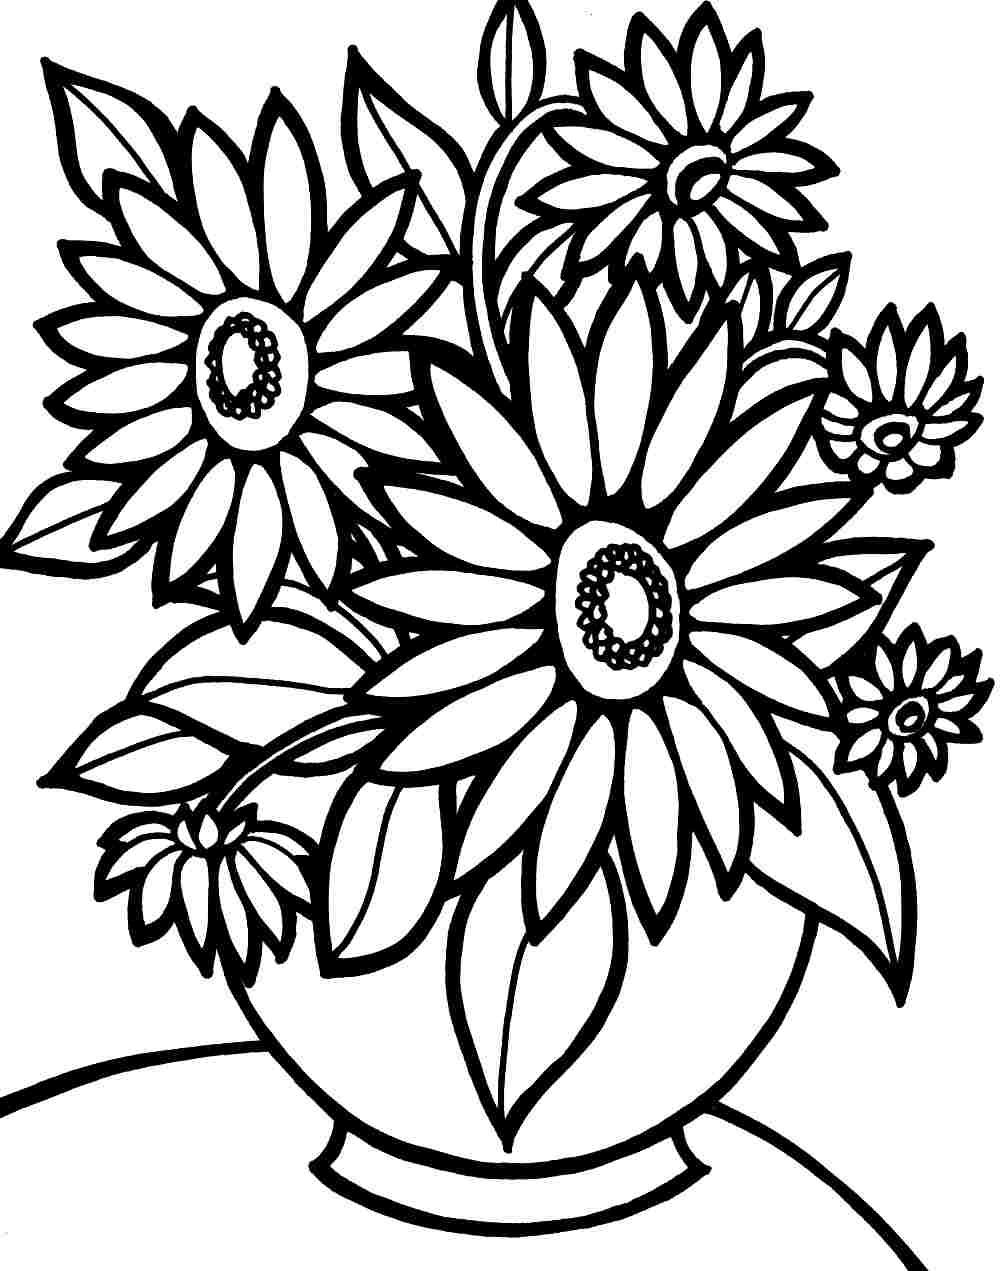 Coloring Pages Flowers Printable Www Mindsandvines Com Inside